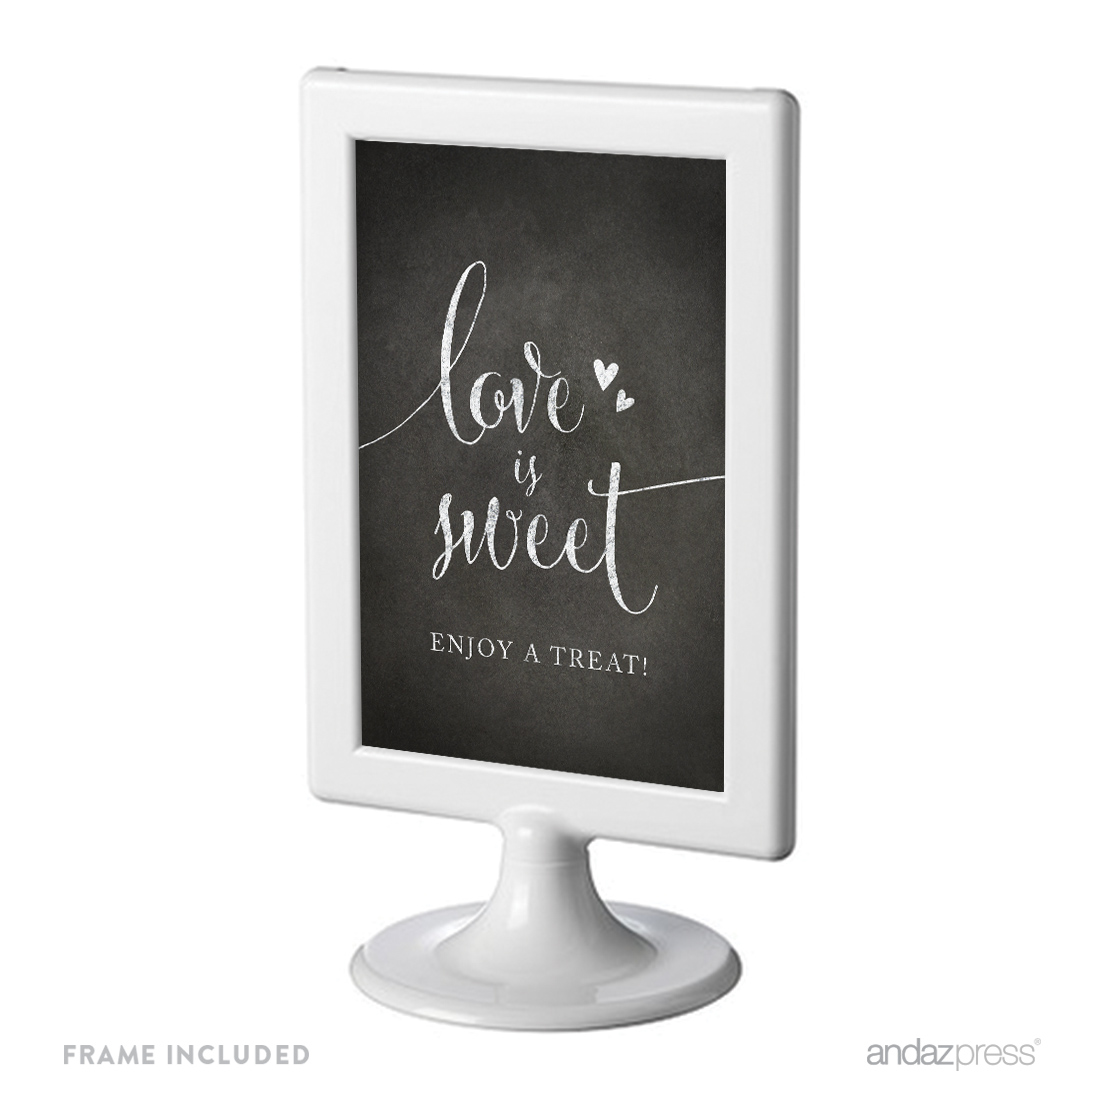 Love Is Sweet, Enjoy A Treat Framed Vintage Chalkboard Wedding Party Signs